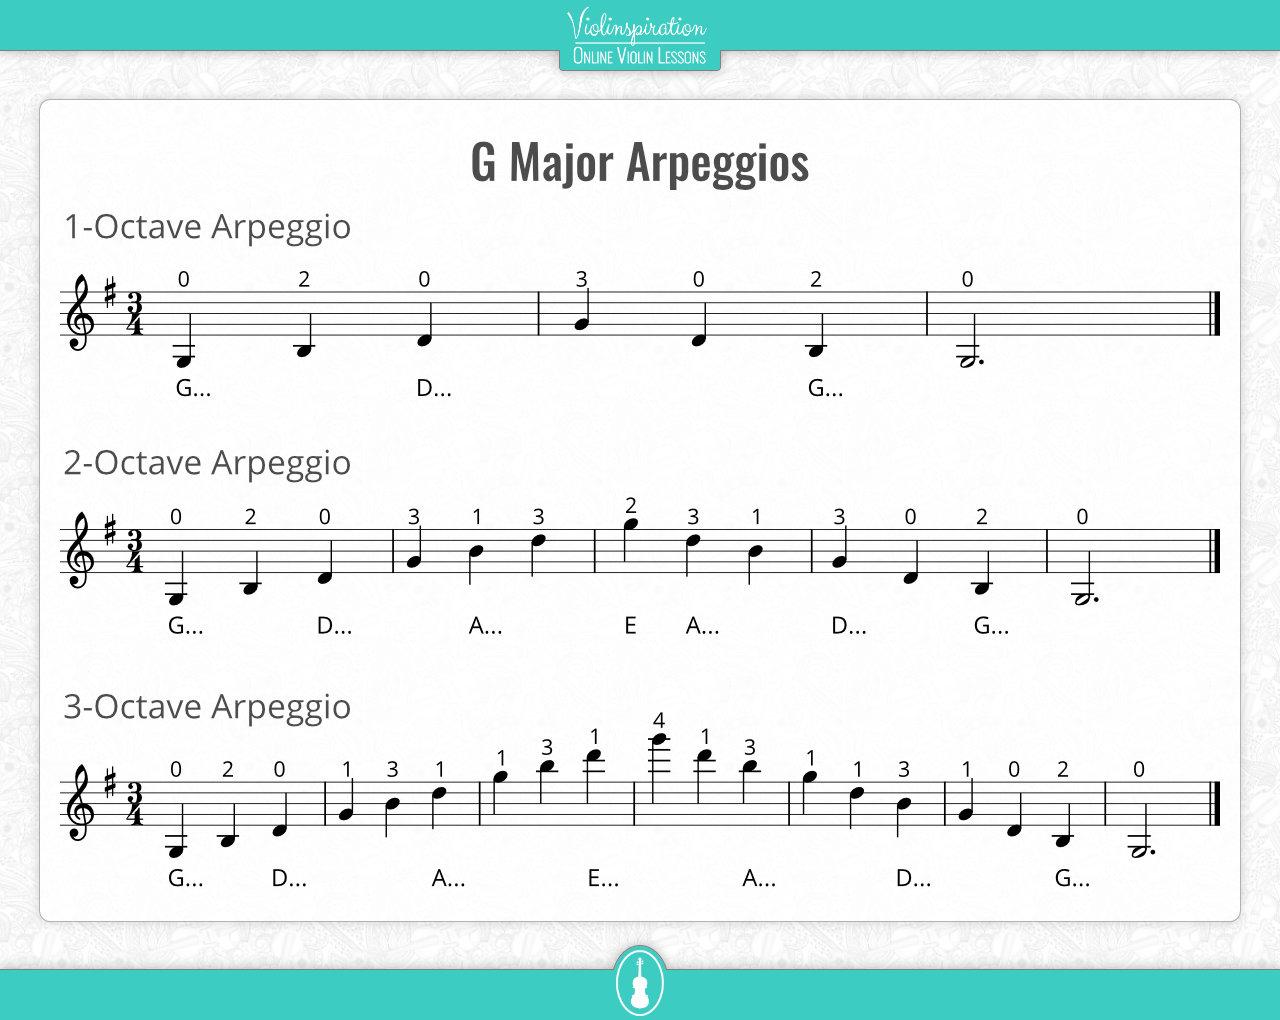 Violin Scales - G Major Scale - Arpeggios